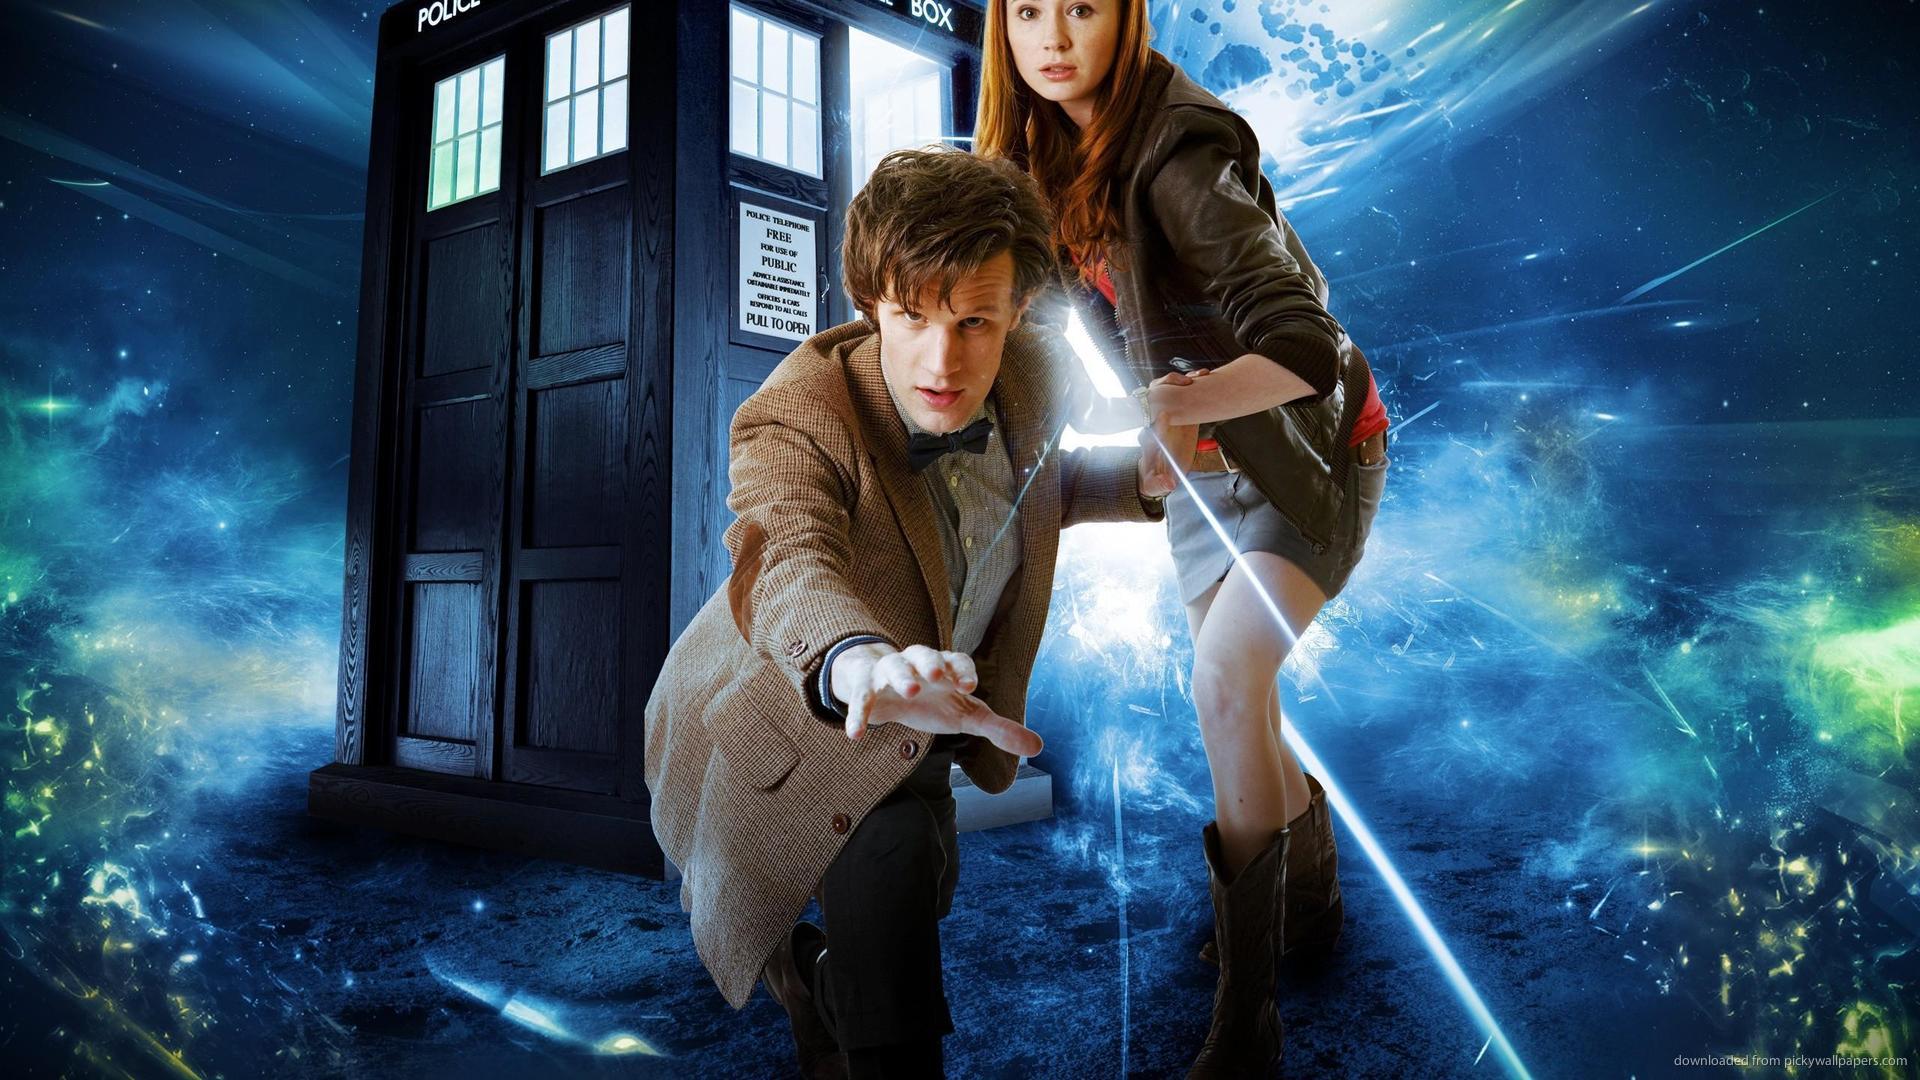 Doctor Who Matt Smith And Karen Gillan picture 1920x1080